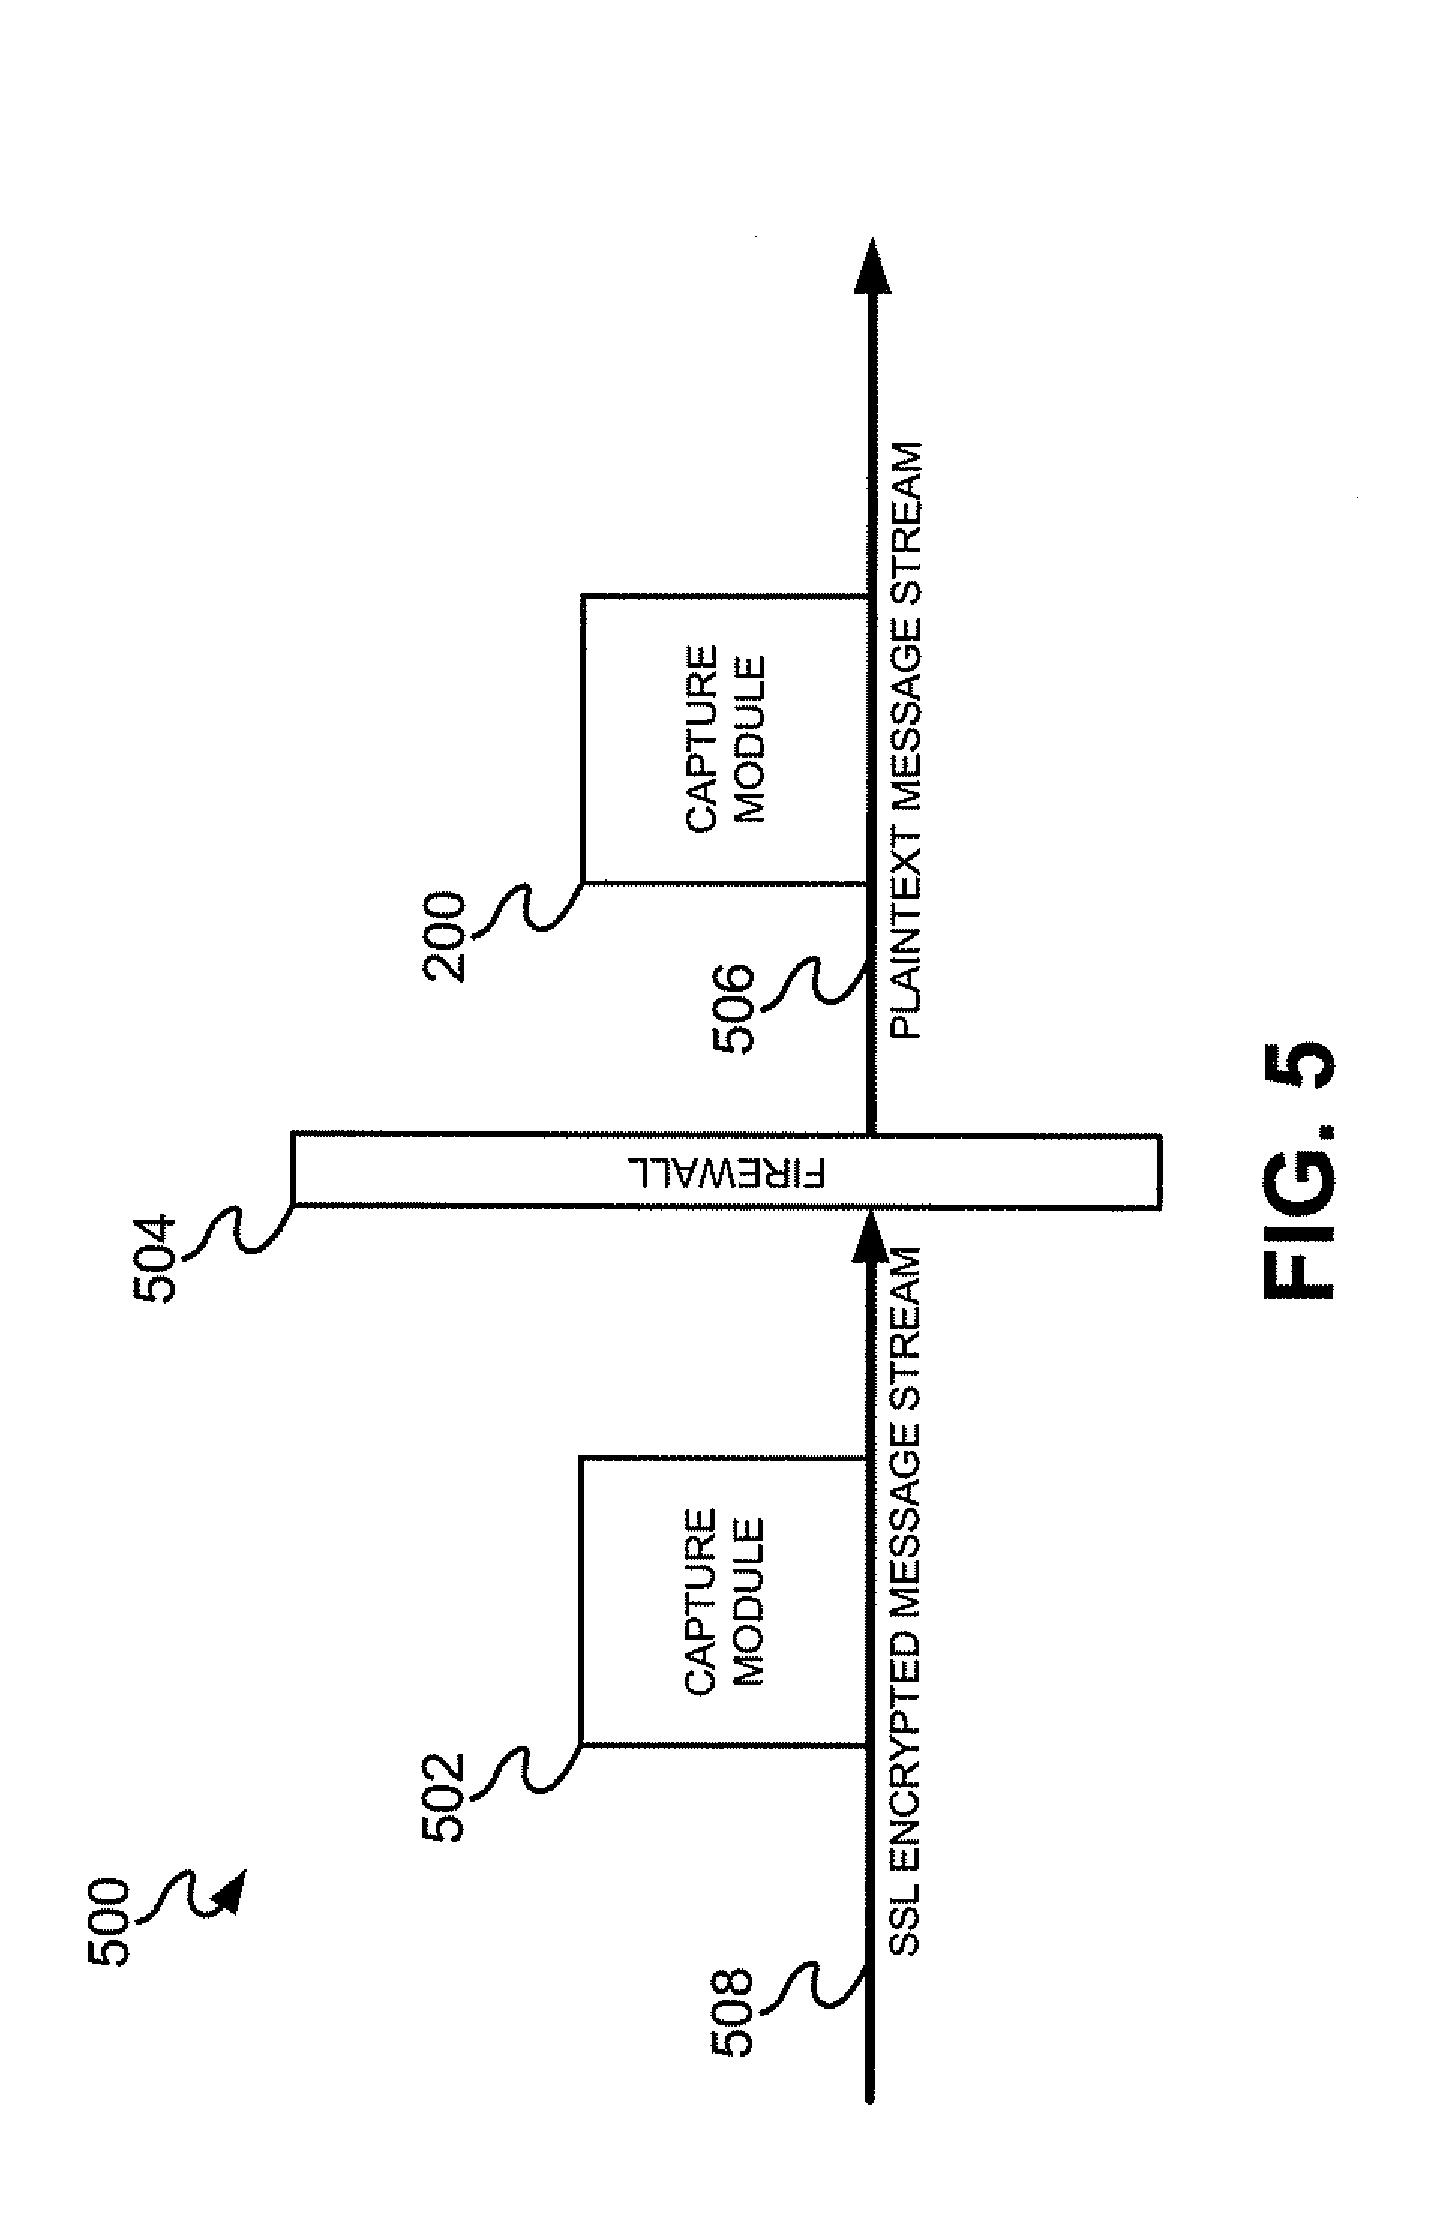 circuit diagram xml blueraritan info rh blueraritan info circuit diagram making circuit diagram xkcd